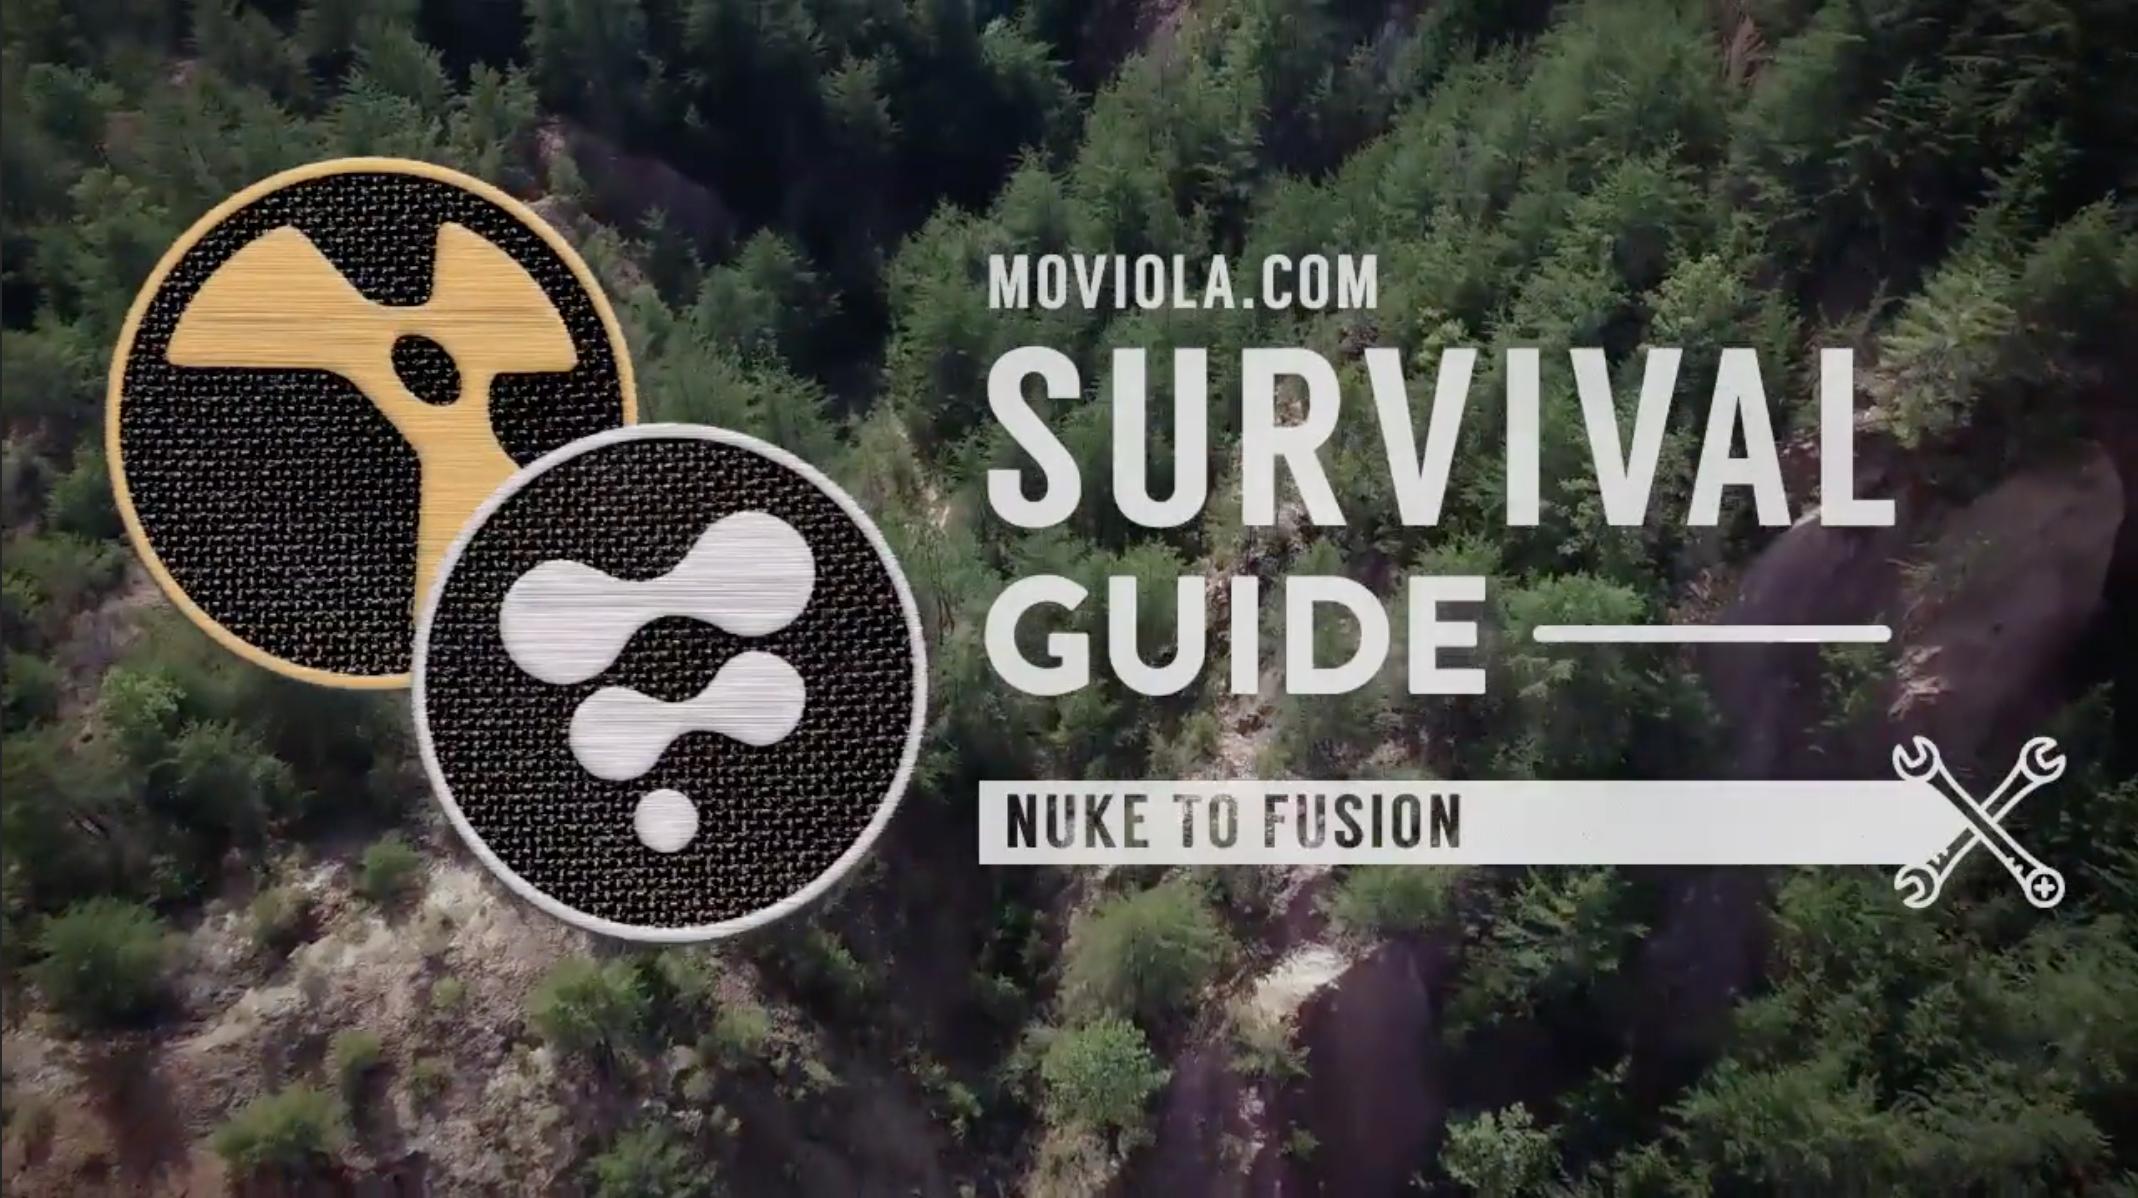 Nuke to Fusion